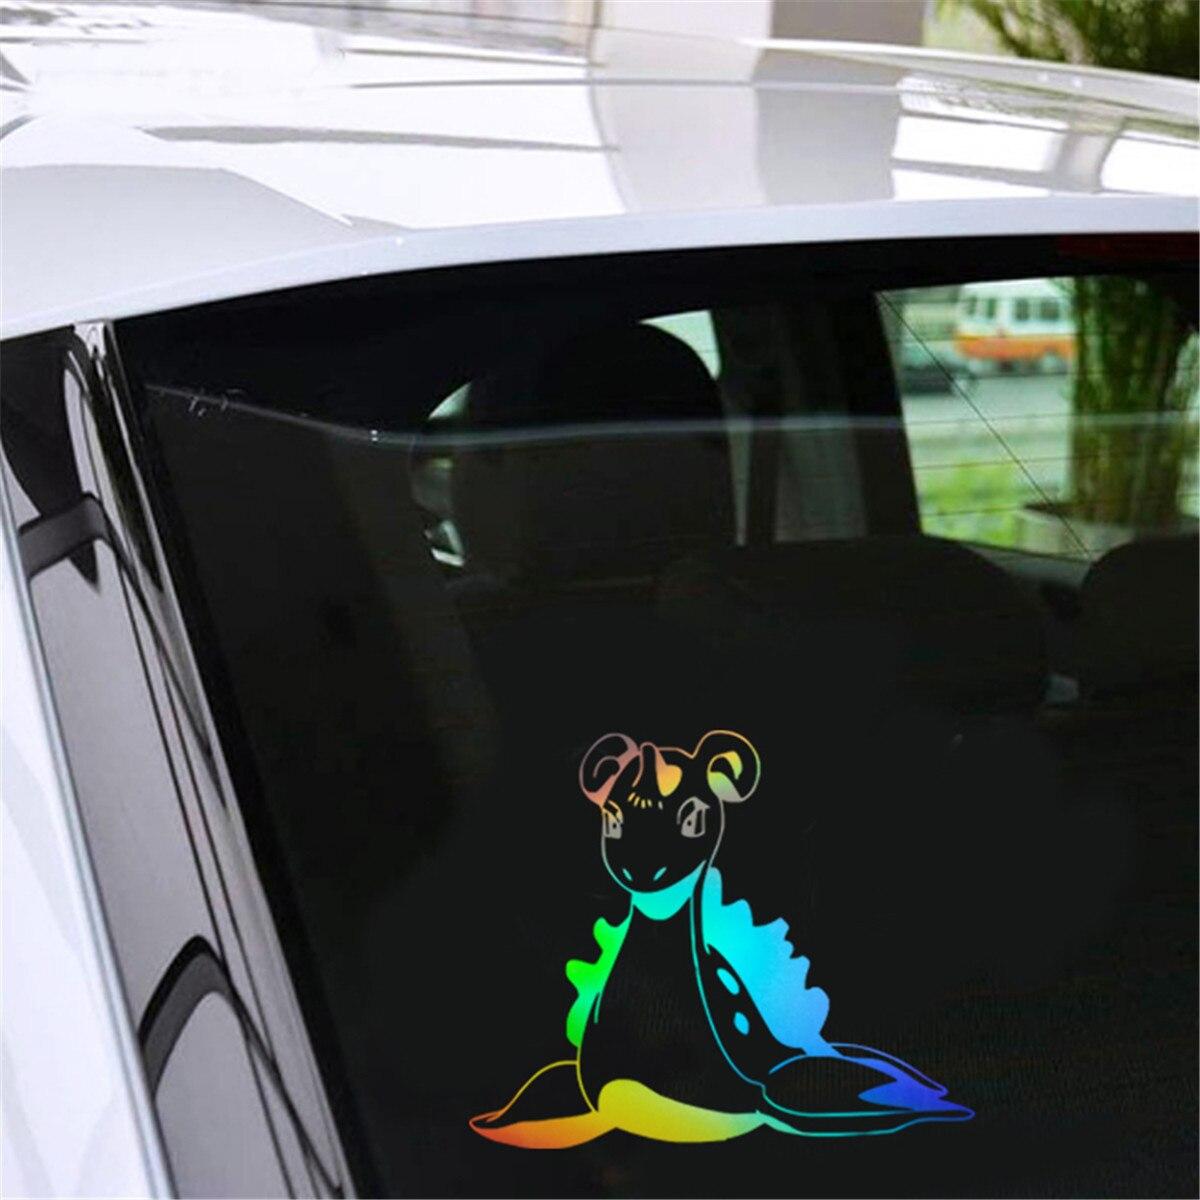 Pokemon Vinyl Decal for laptop windows wall car boat